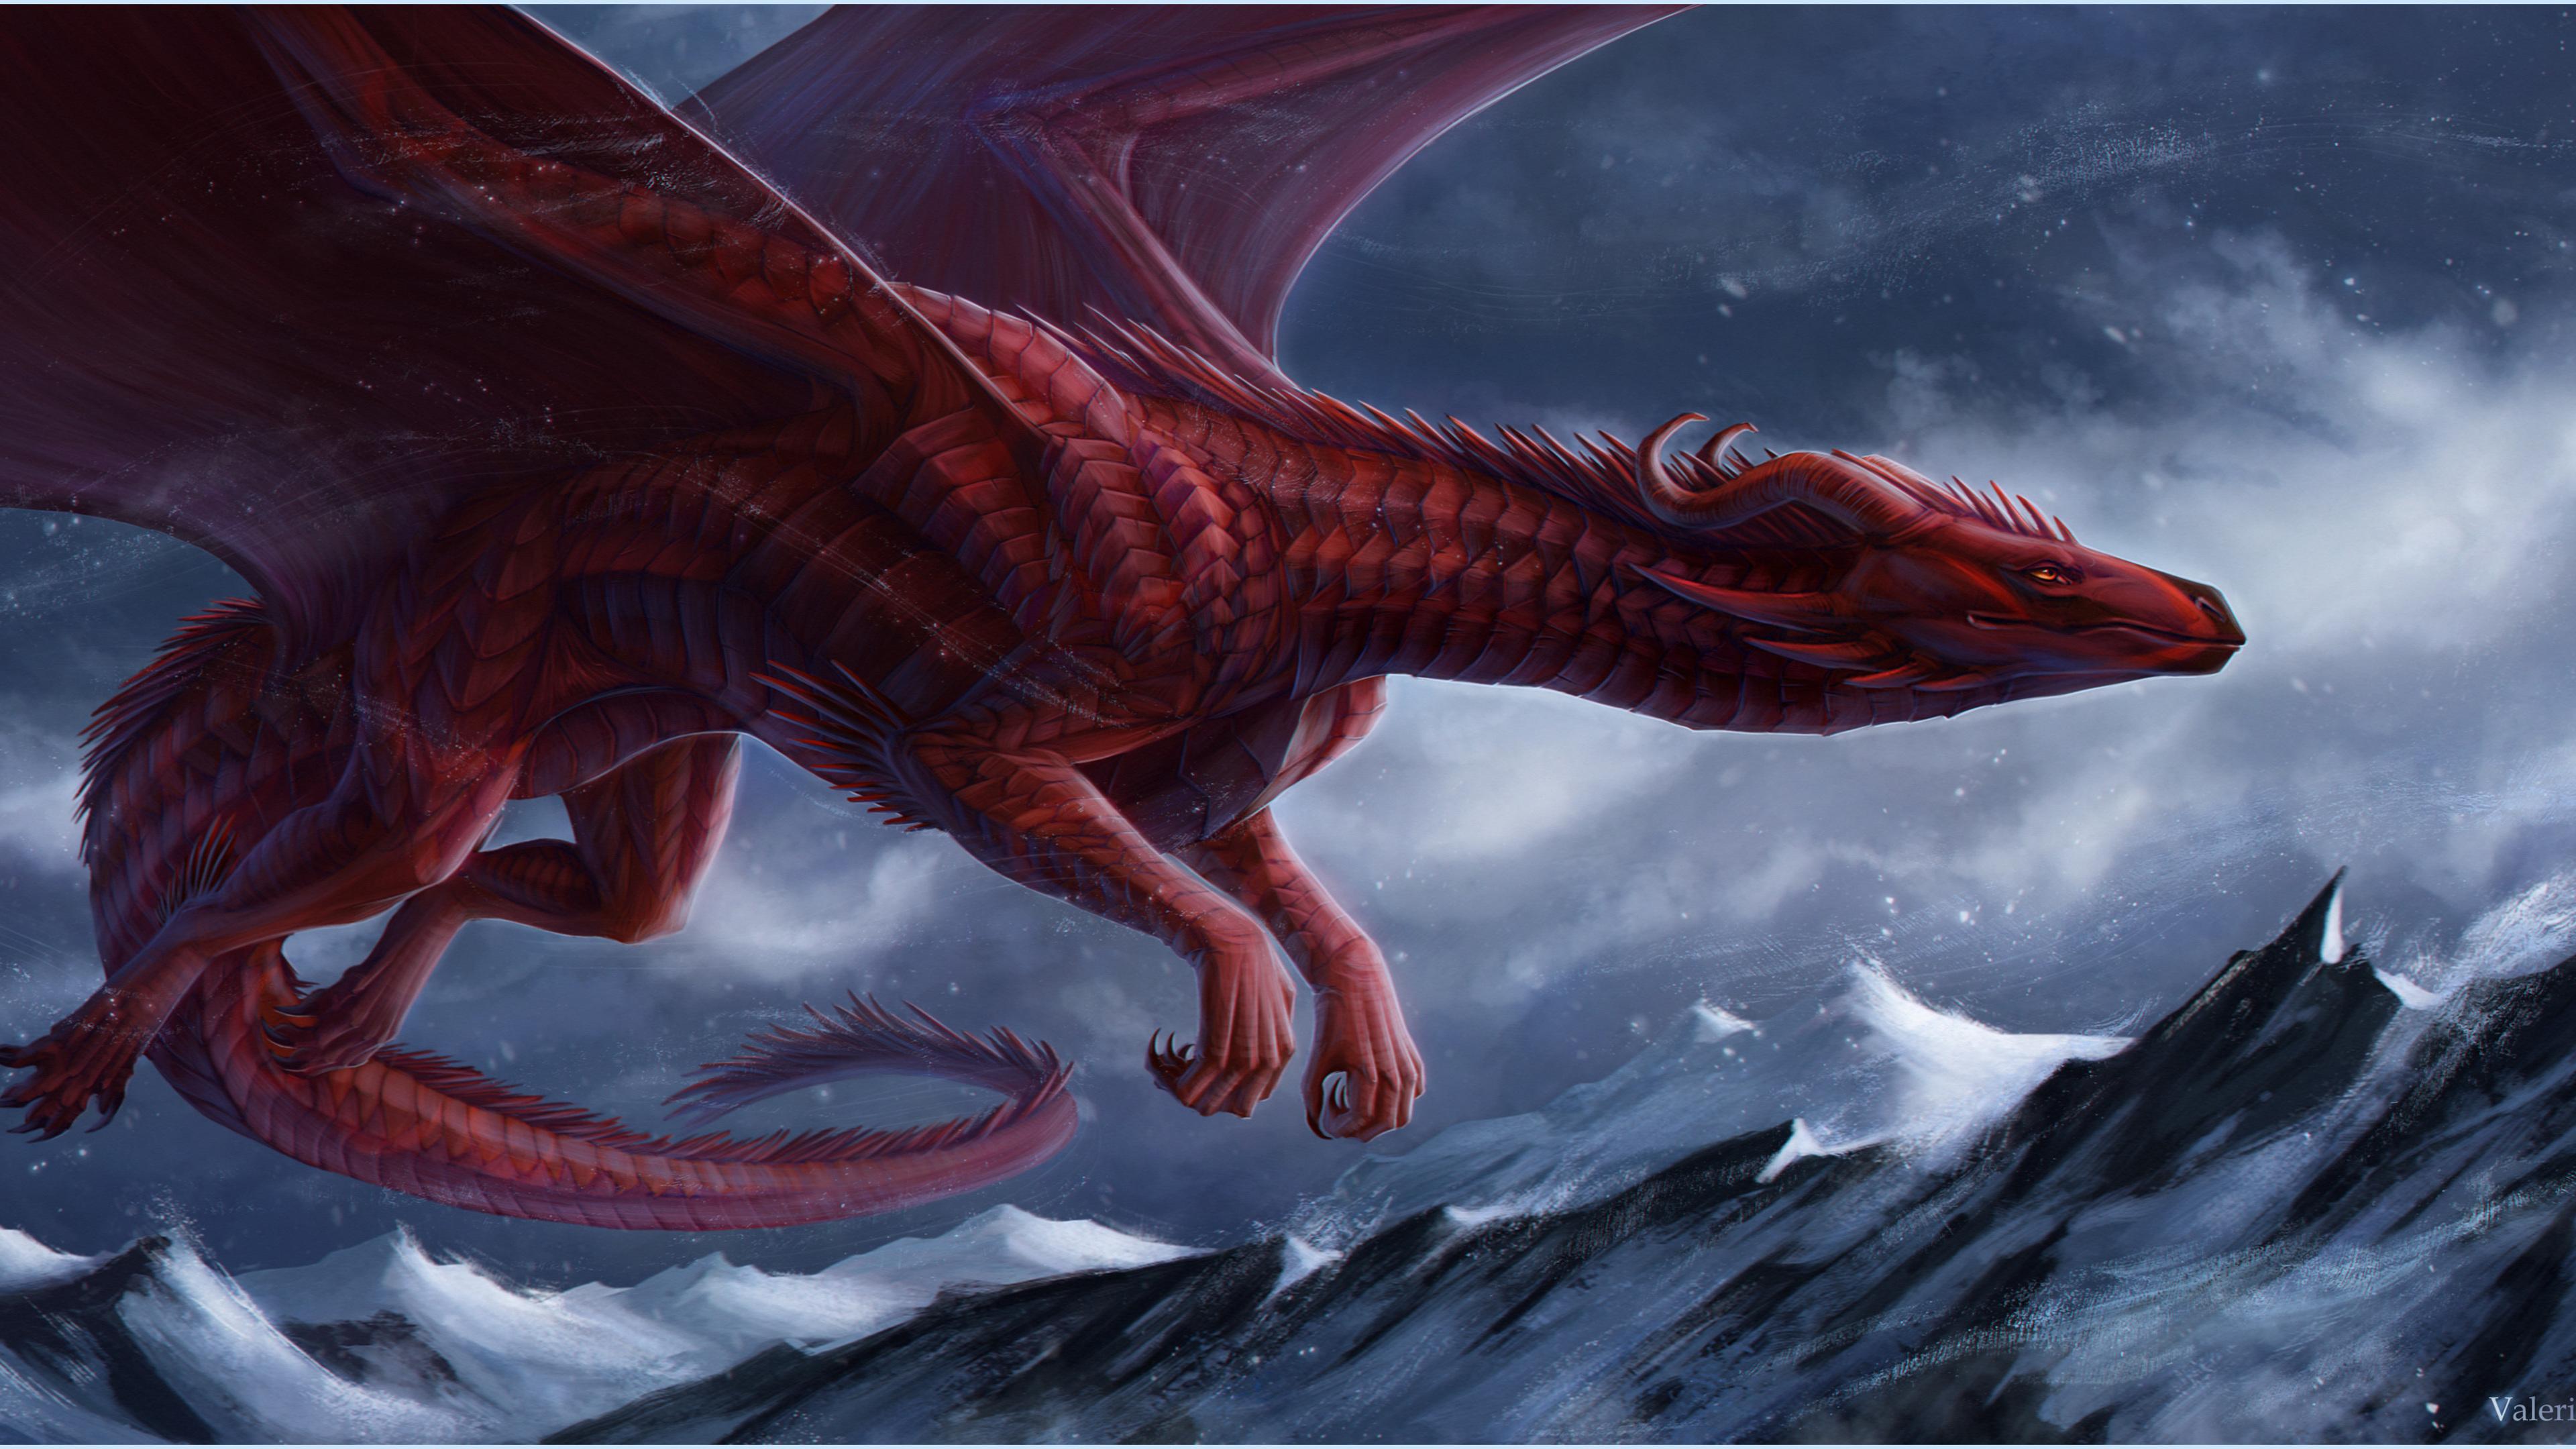 big red dragon 4k 1540751483 - Big Red Dragon 4k - hd-wallpapers, dragon wallpapers, digital art wallpapers, deviantart wallpapers, artwork wallpapers, artist wallpapers, 4k-wallpapers